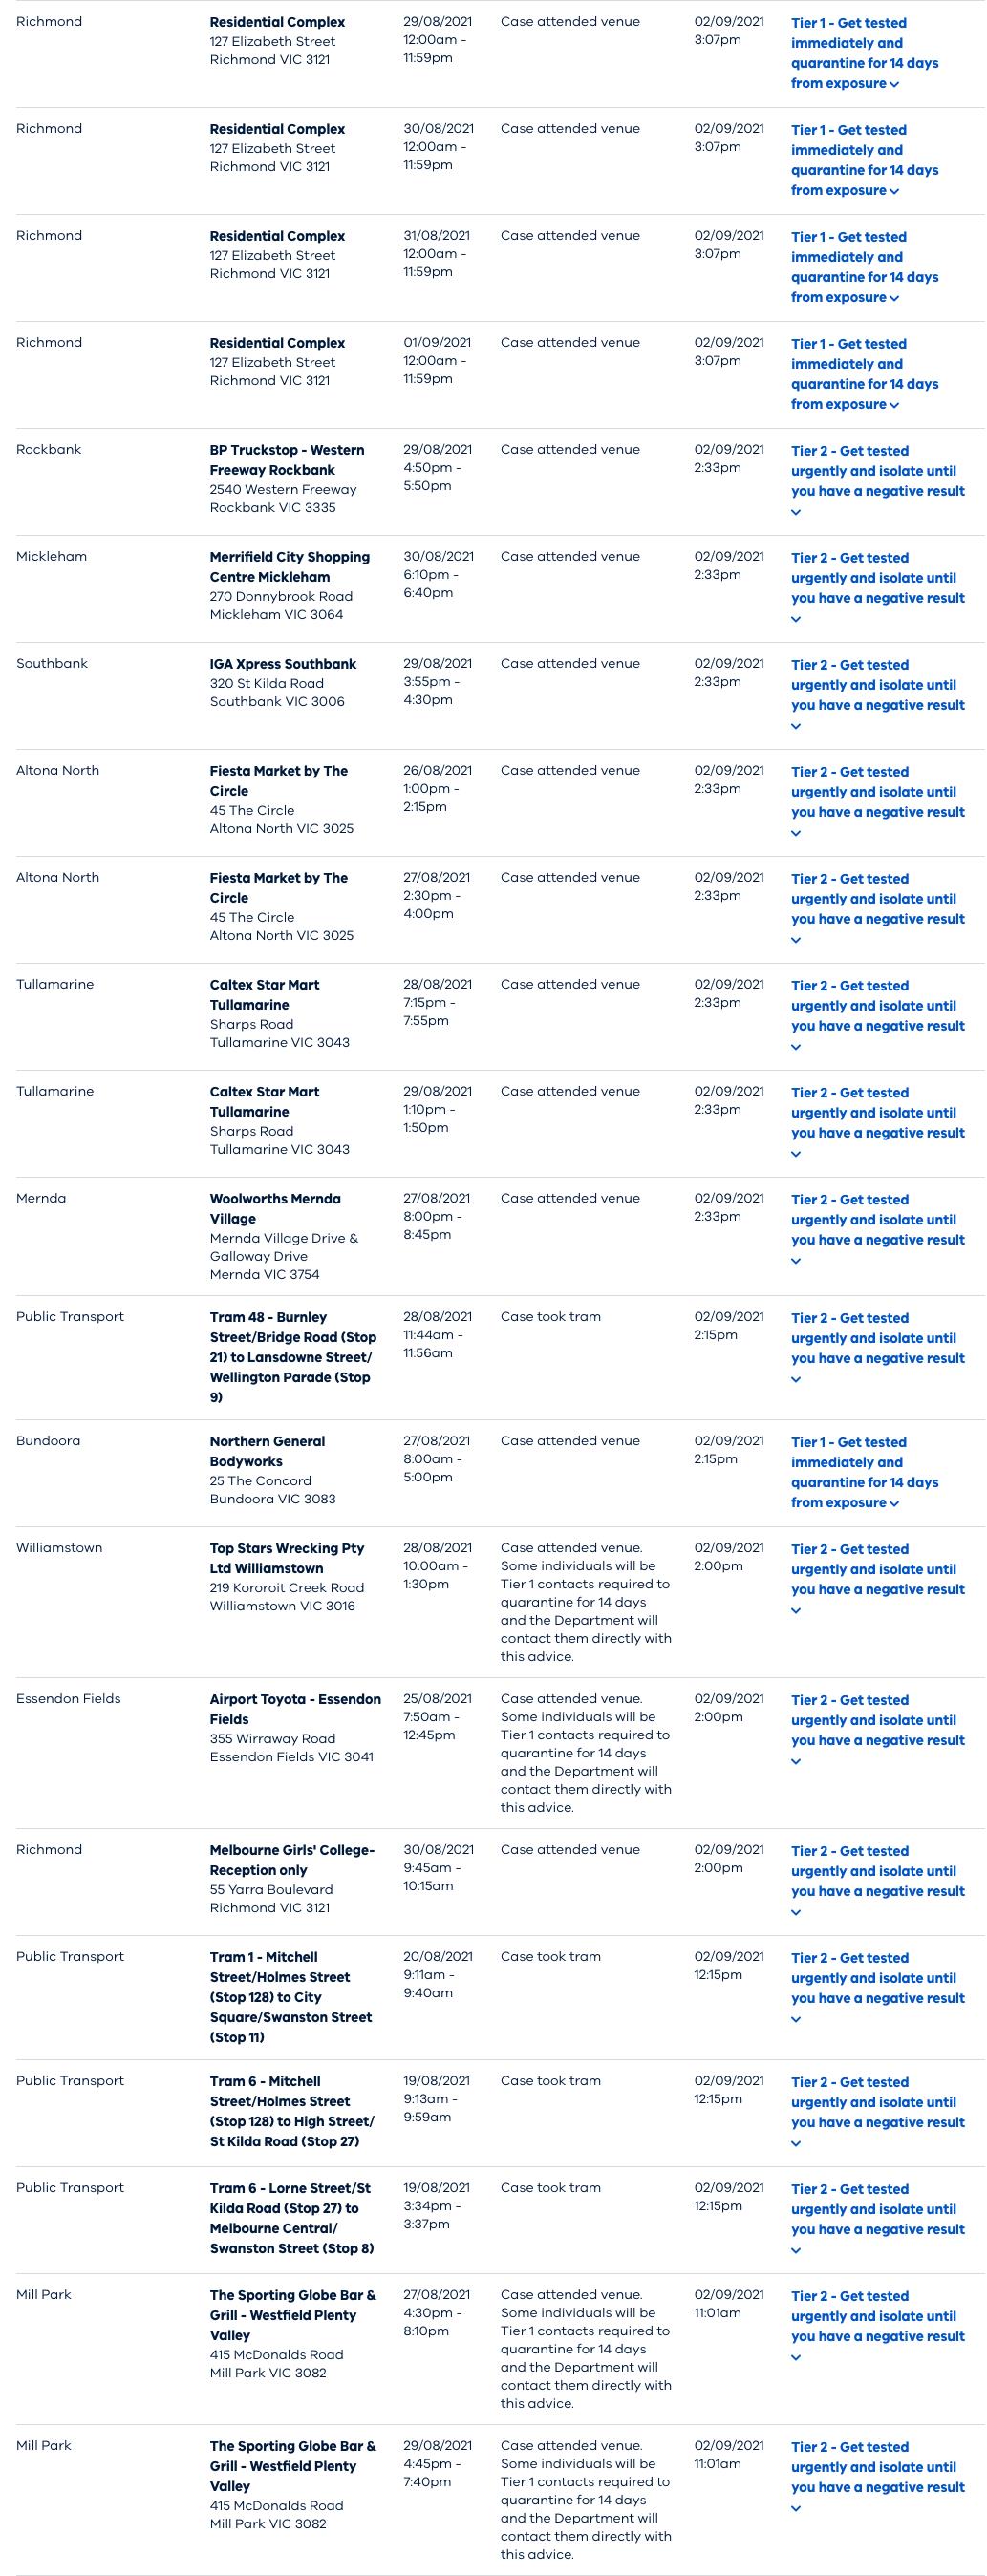 www.coronavirus.vic.gov.au_exposure-sites (31).png